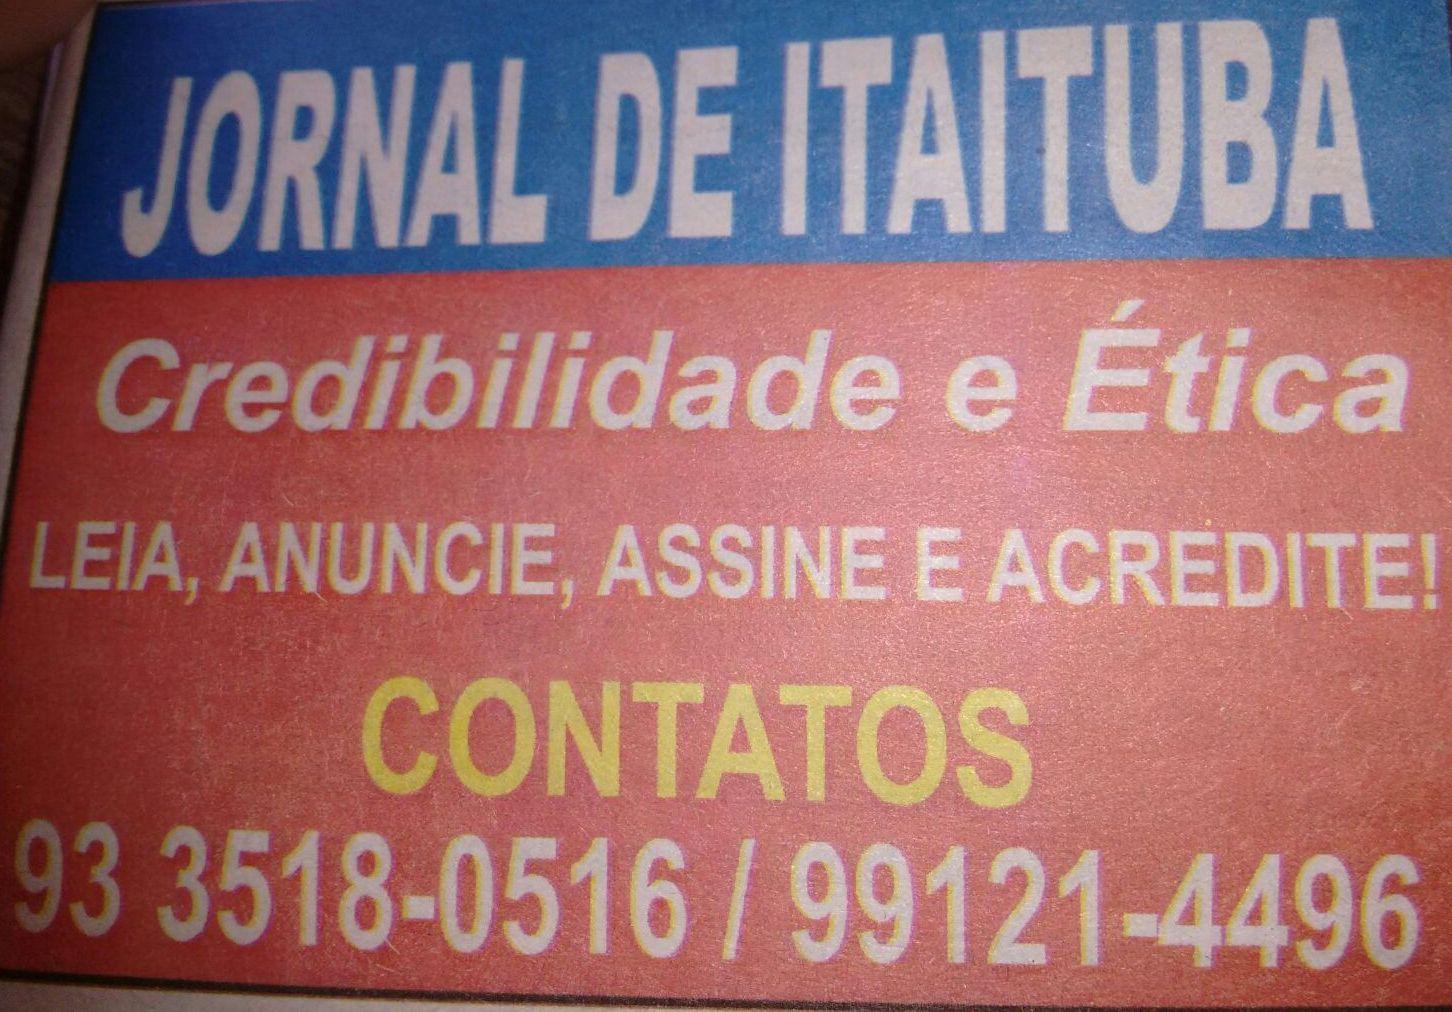 Jornal de Itaituba / Falar com Cesar Paiva